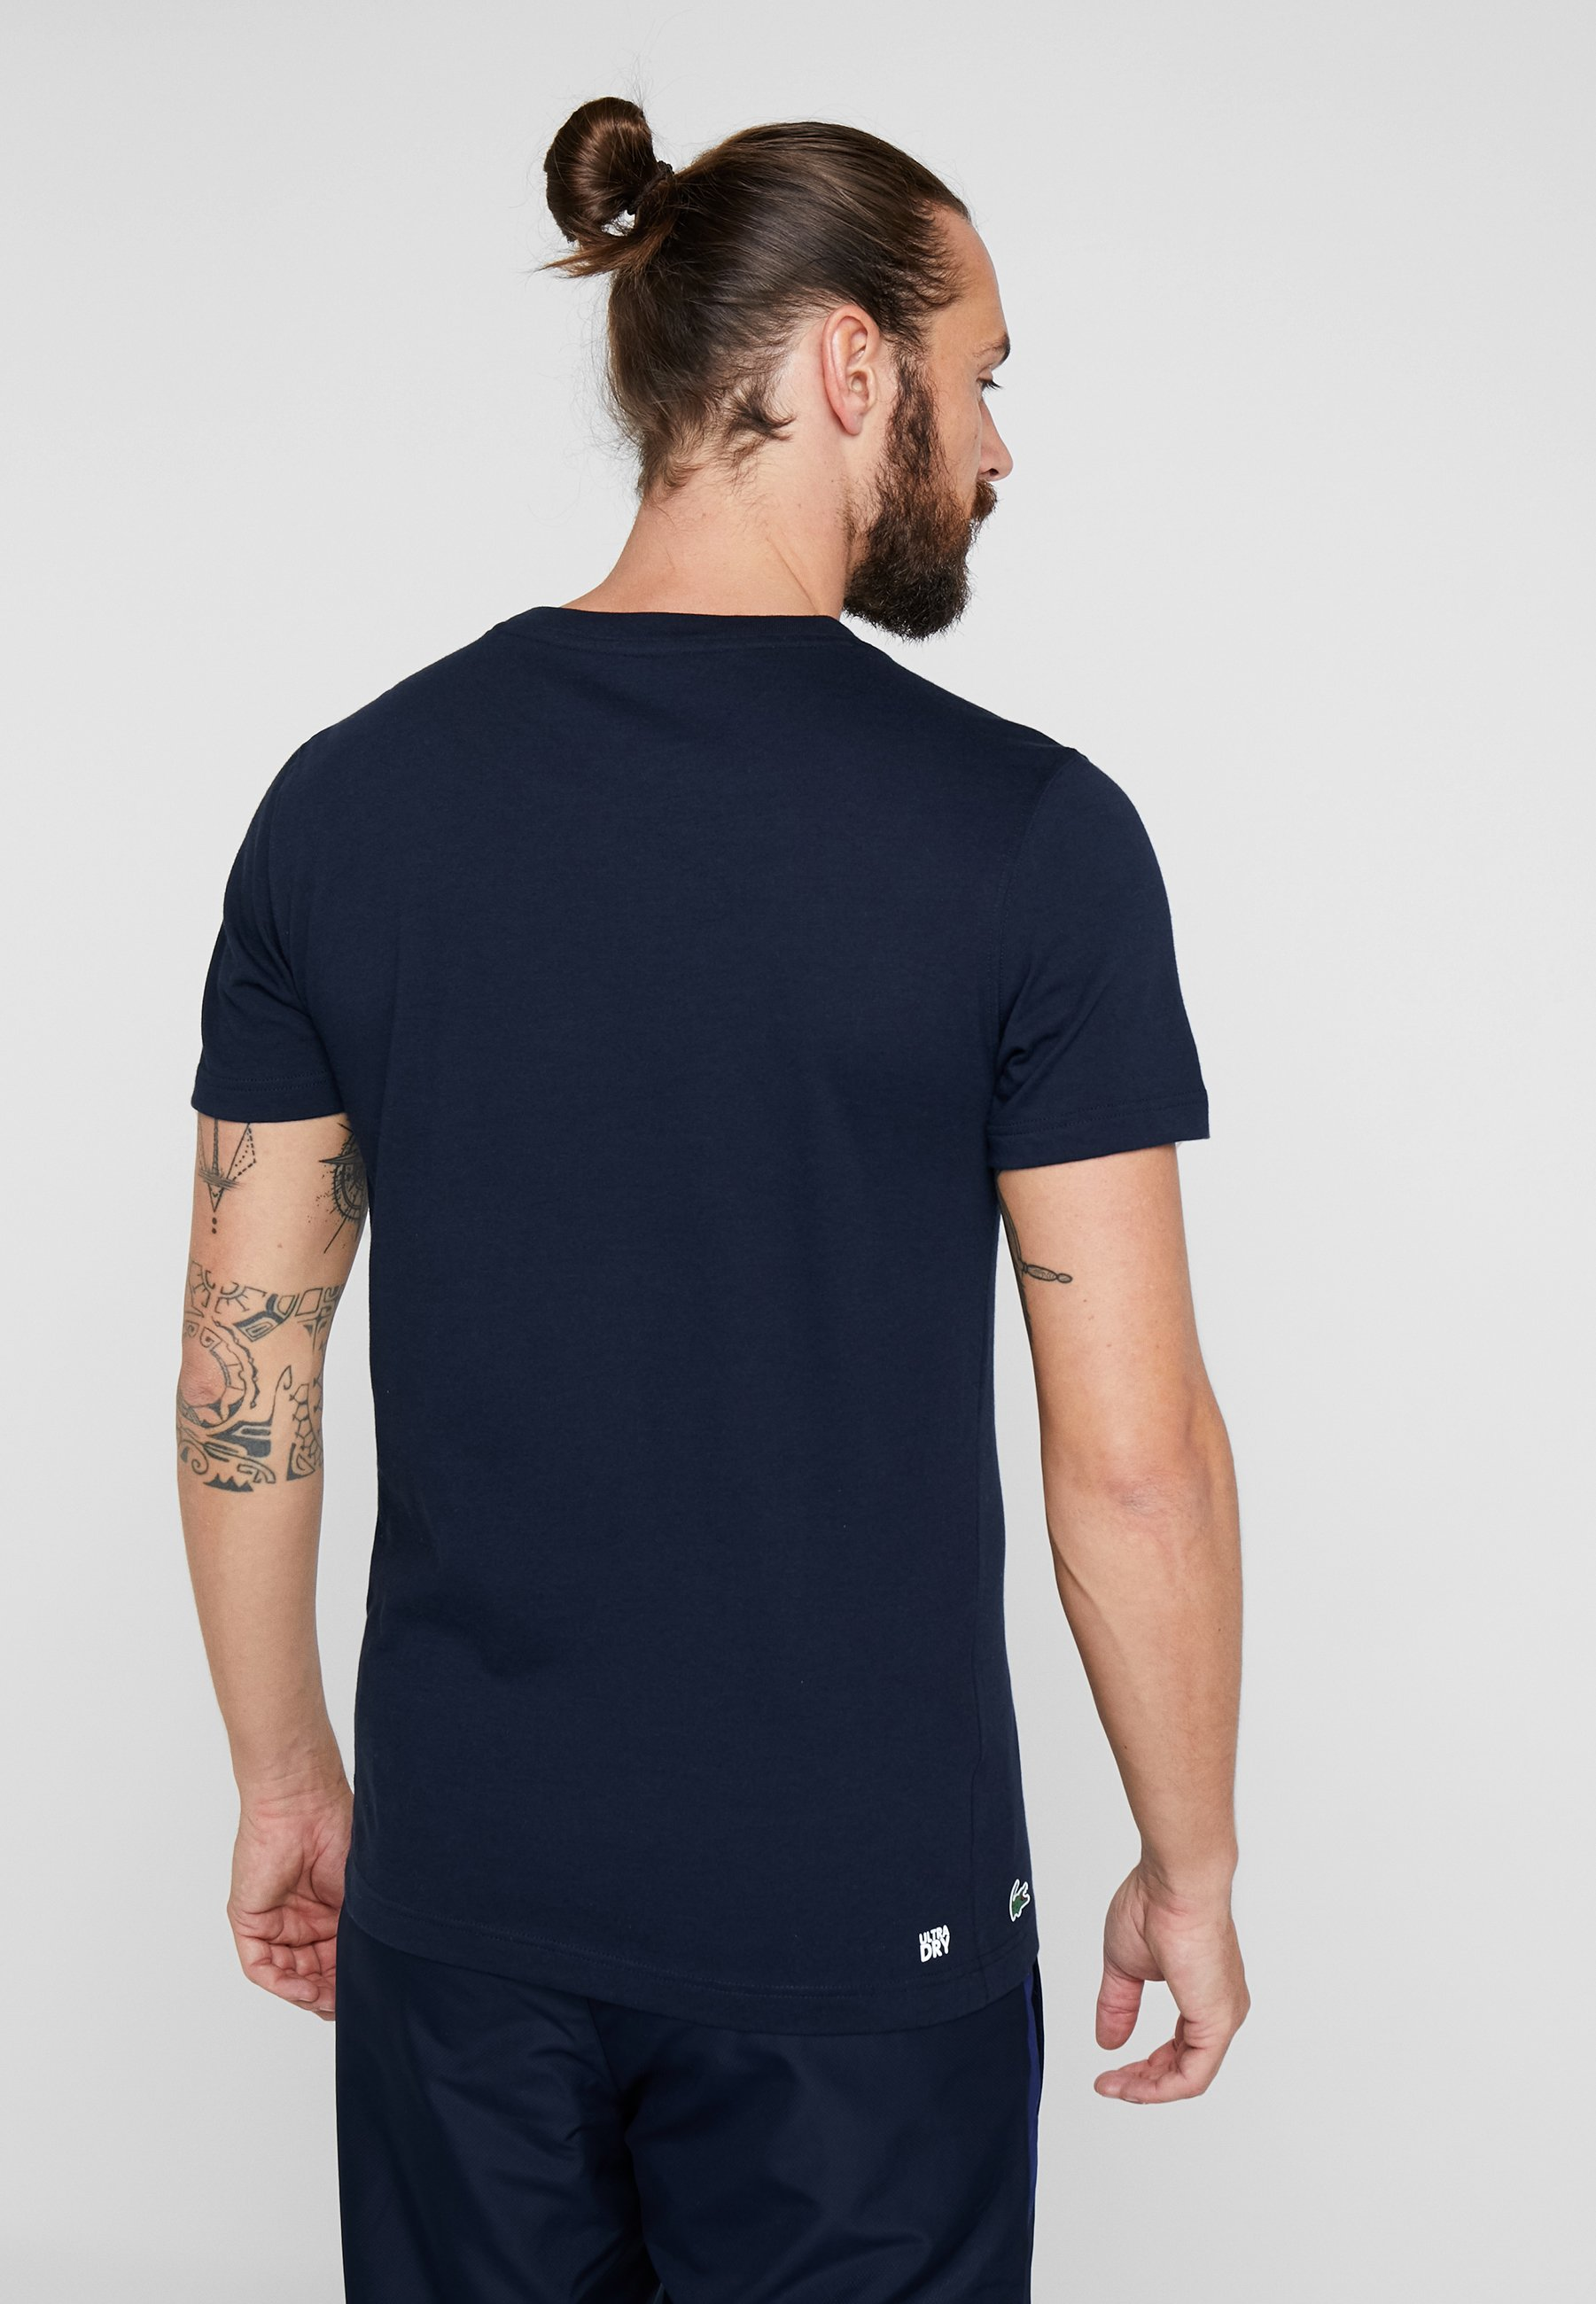 GraphicT white Lacoste red Sport Imprimé shirt Navy Blue mvN8y0nwO